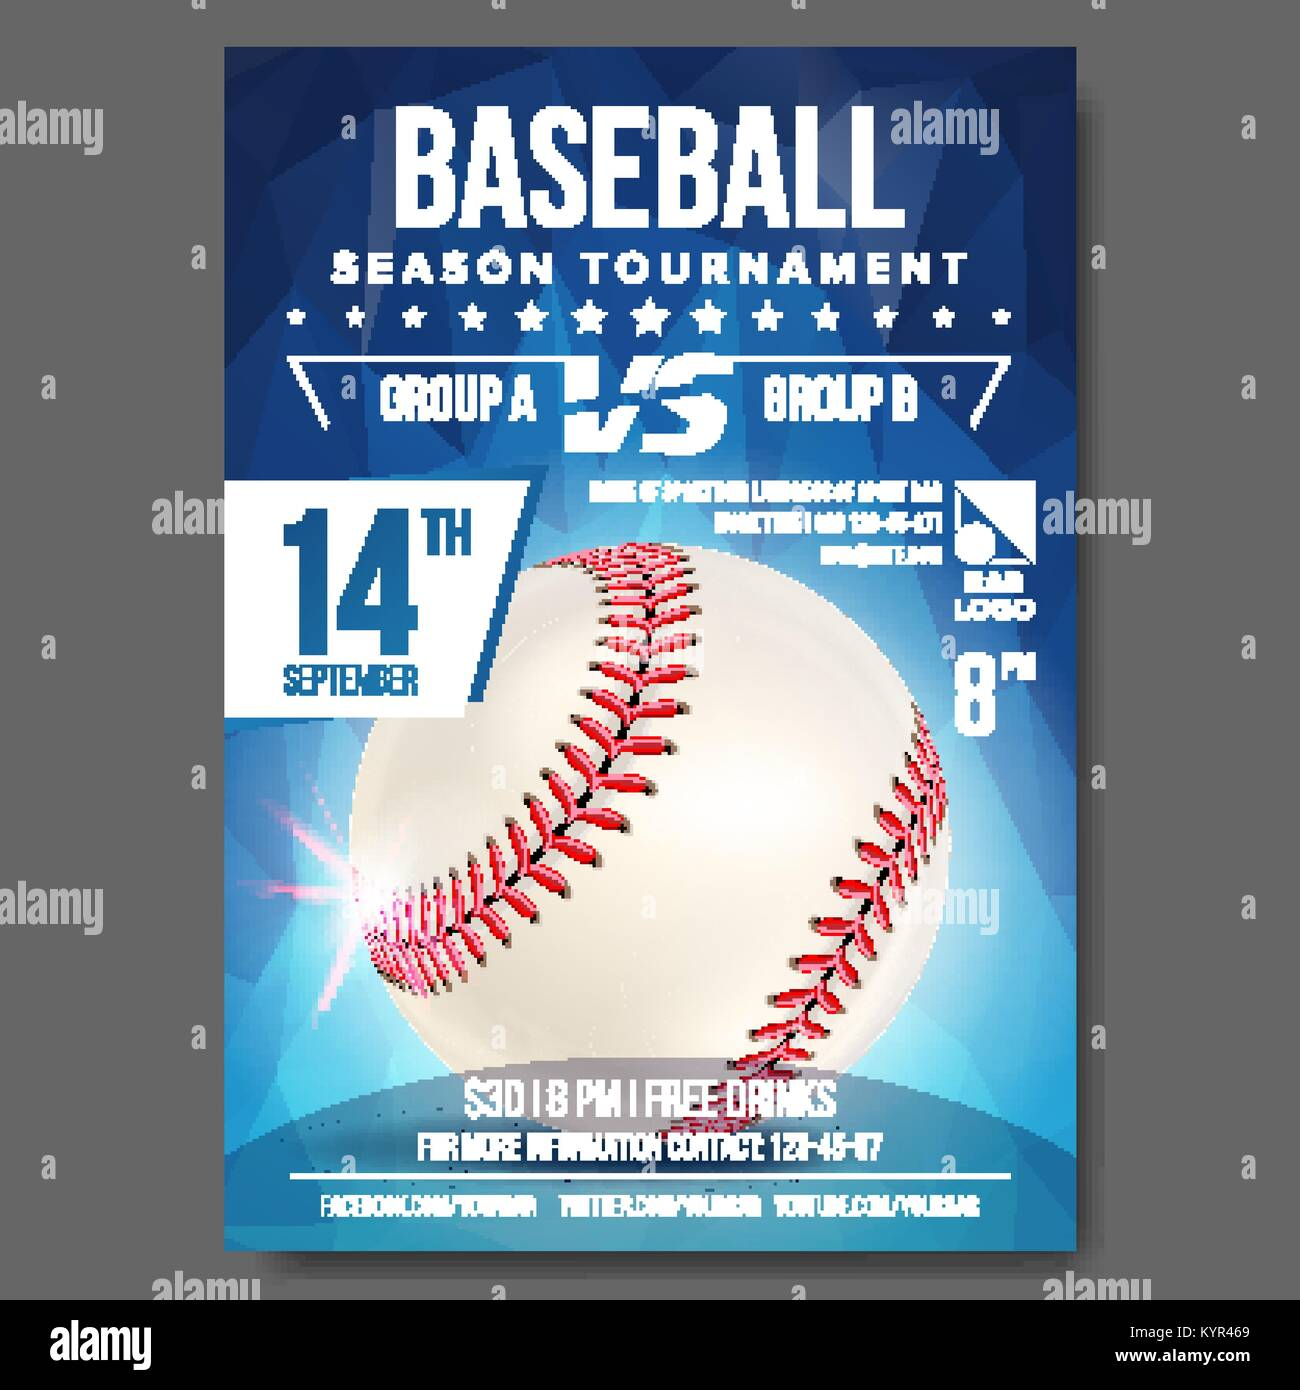 Baseball Poster Vector. Banner Advertising. Sport Event Announcement. Announcement, Game, League Design. Championship Stock Vector